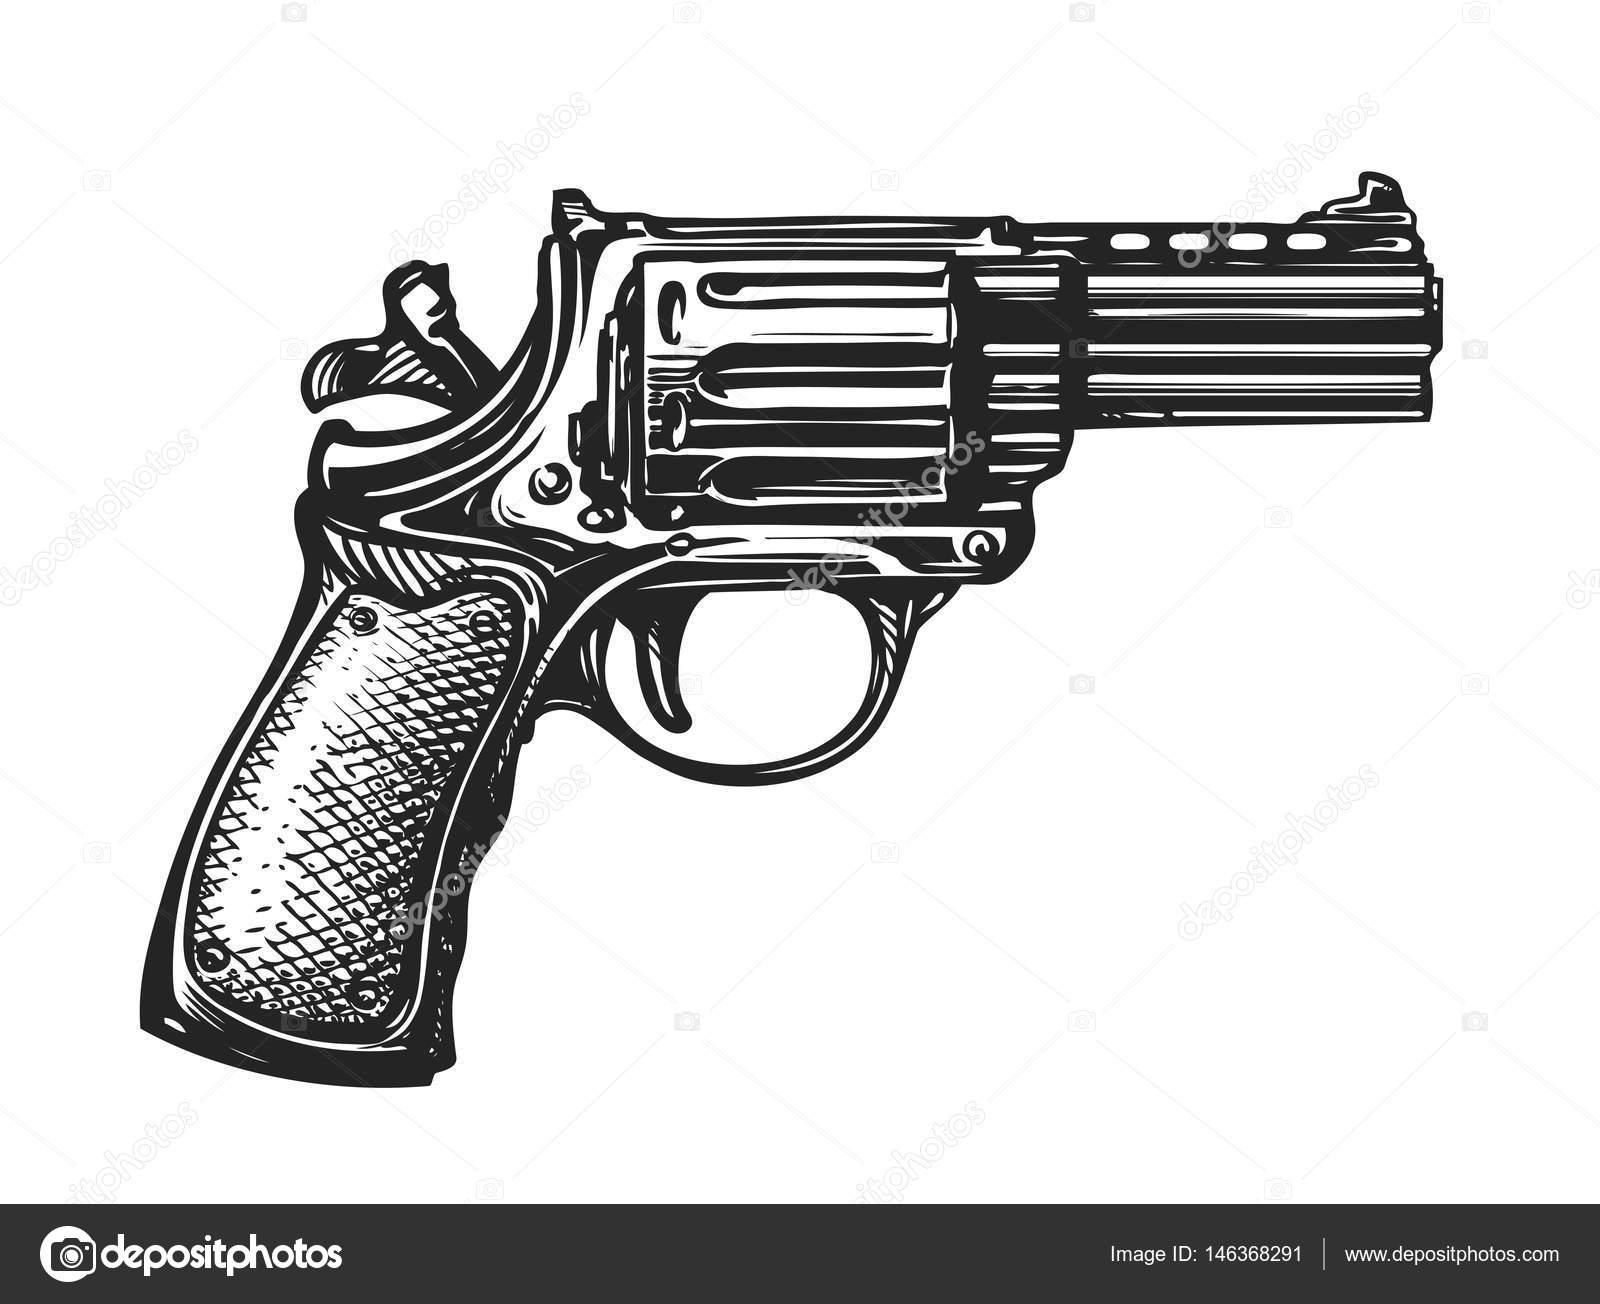 Drawn pistol vintage Illustration — Vintage vector drawn